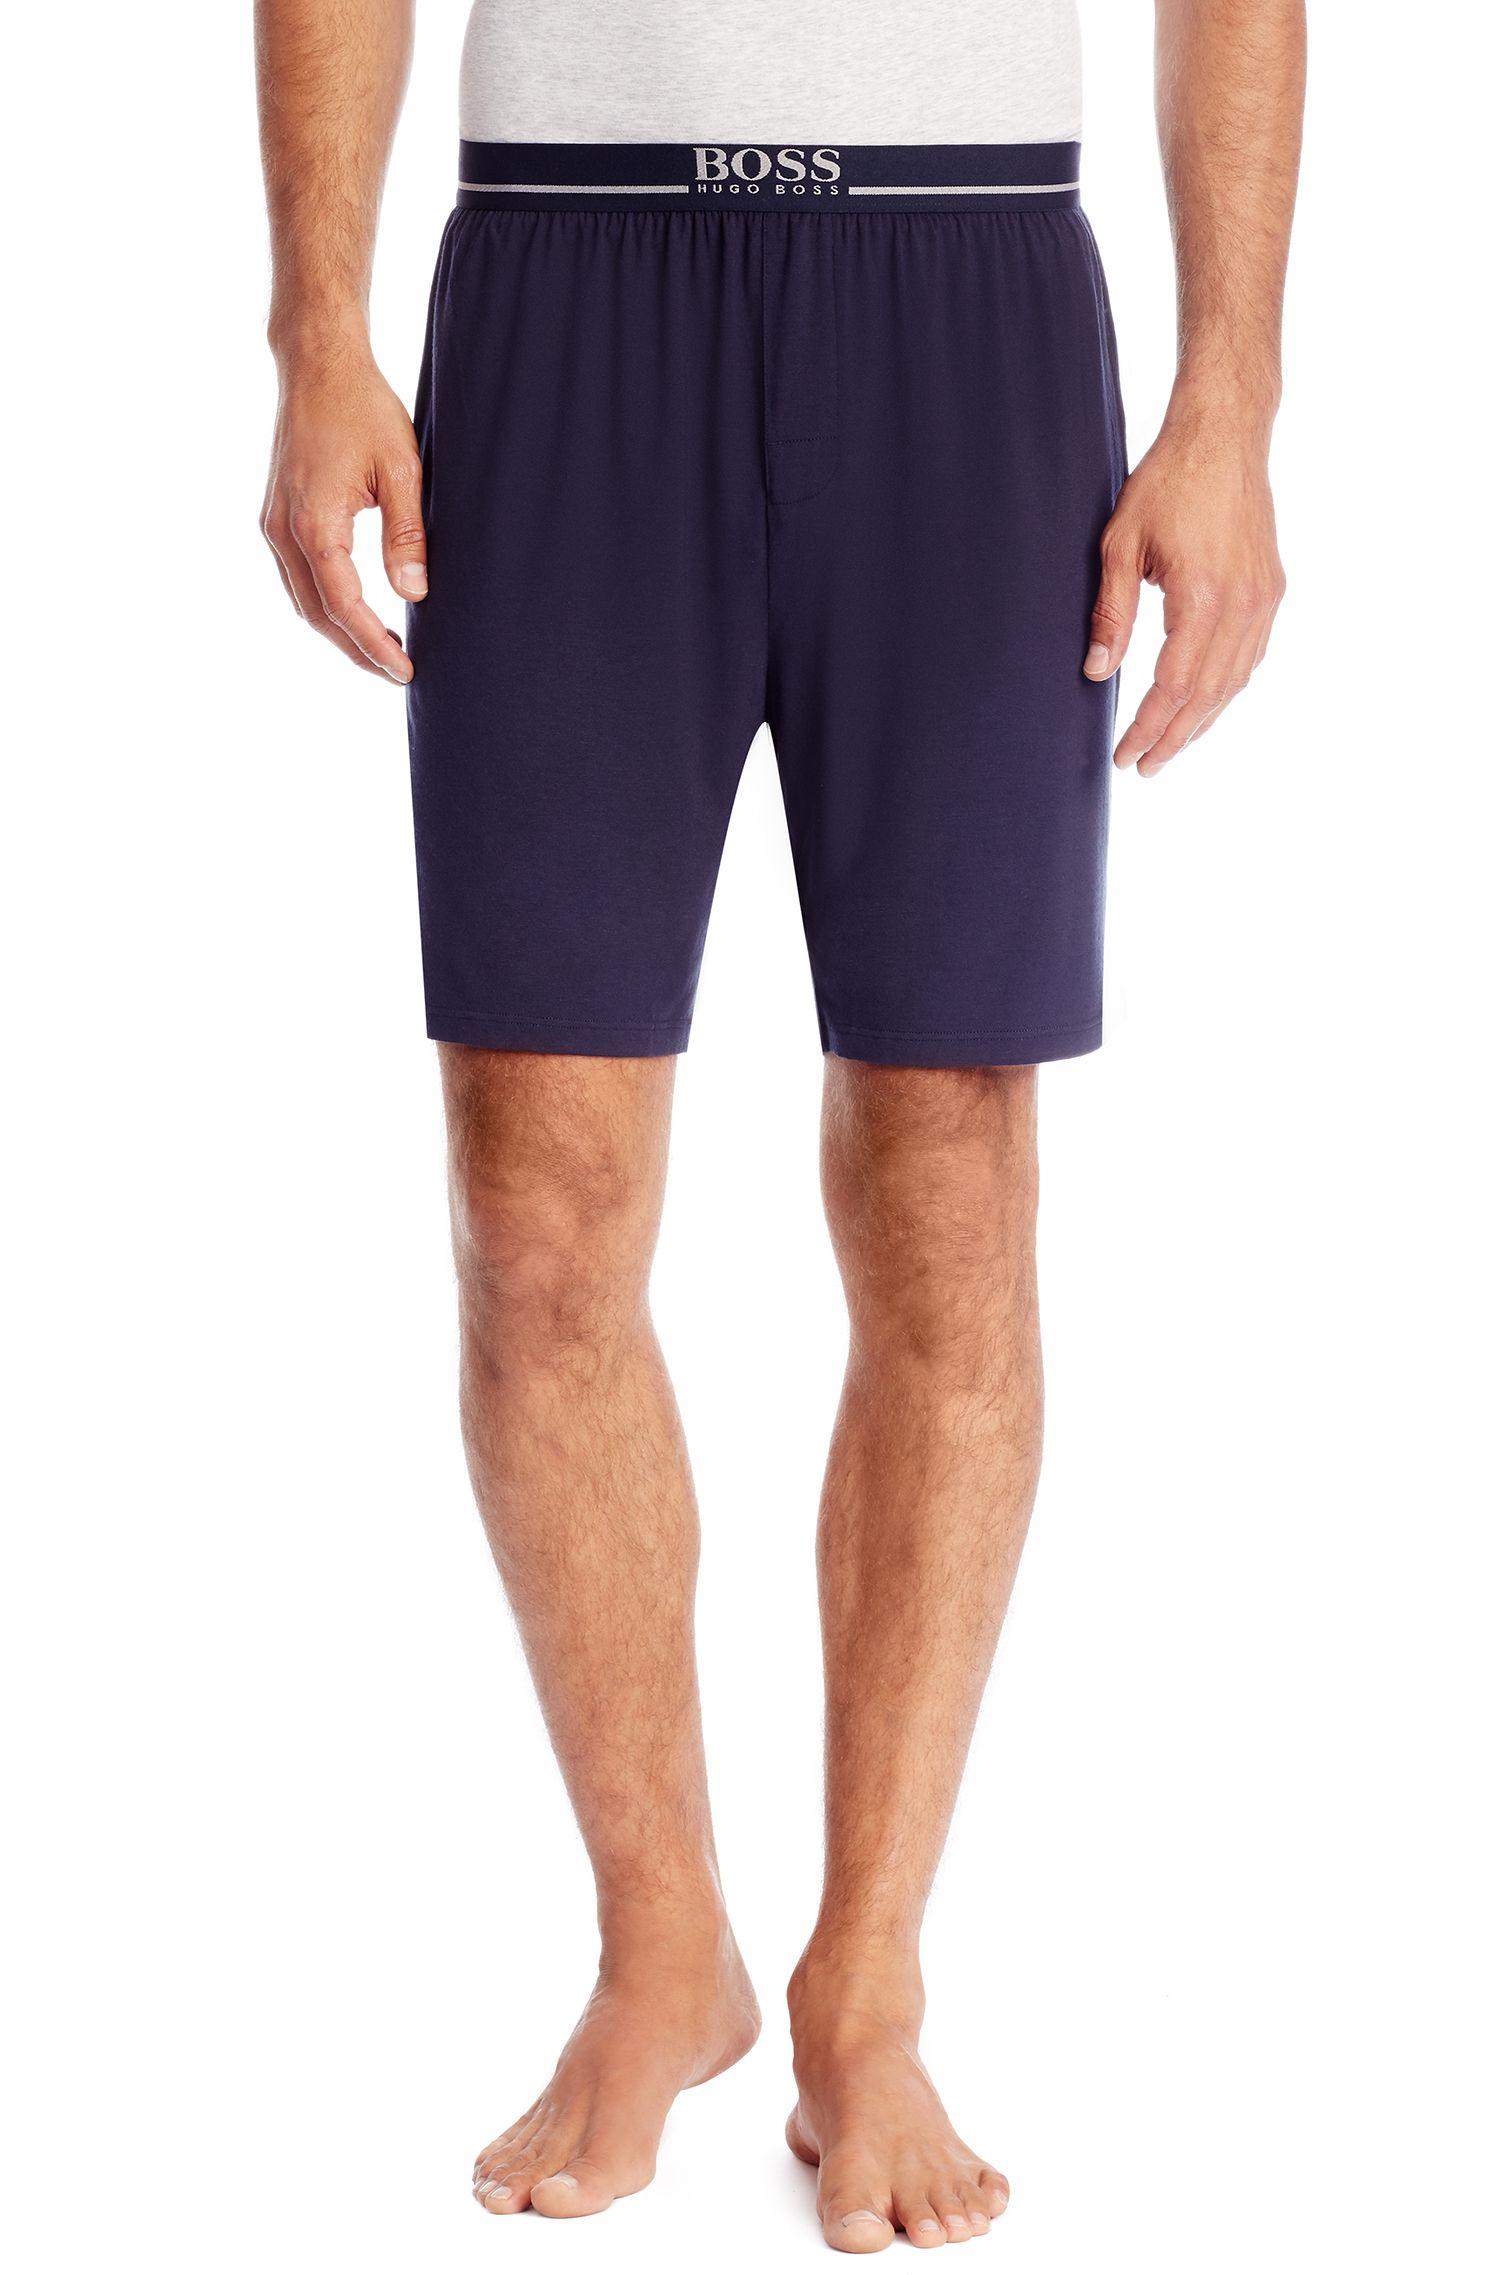 Stretch Modal Lounge Shorts | Short Pant EW